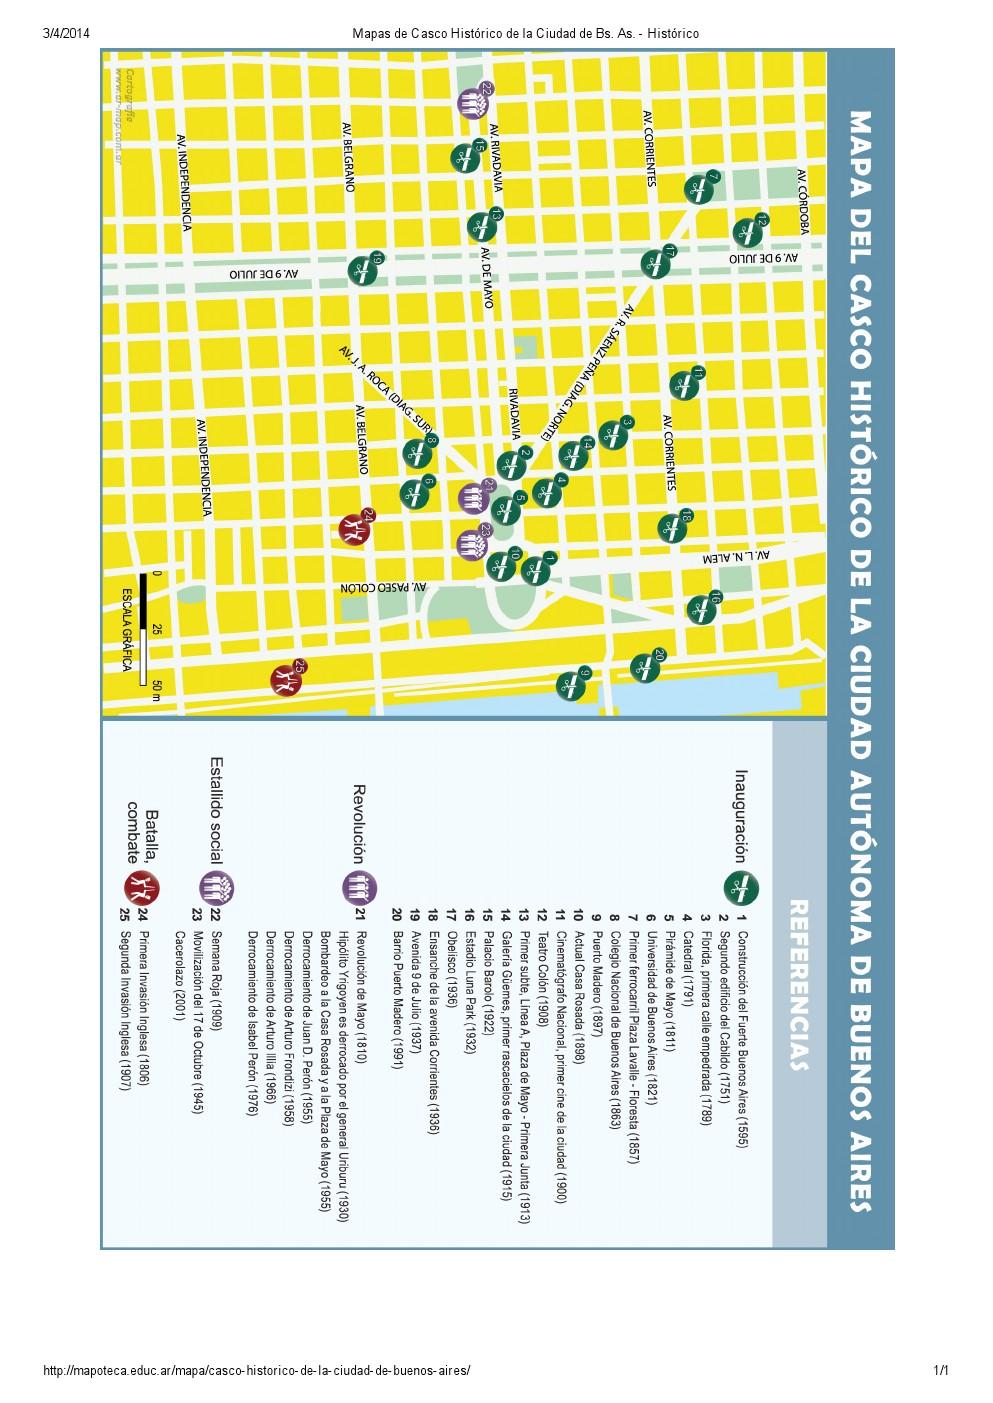 Mapa del casco histórico de Buenos Aires. Mapoteca de Educ.ar